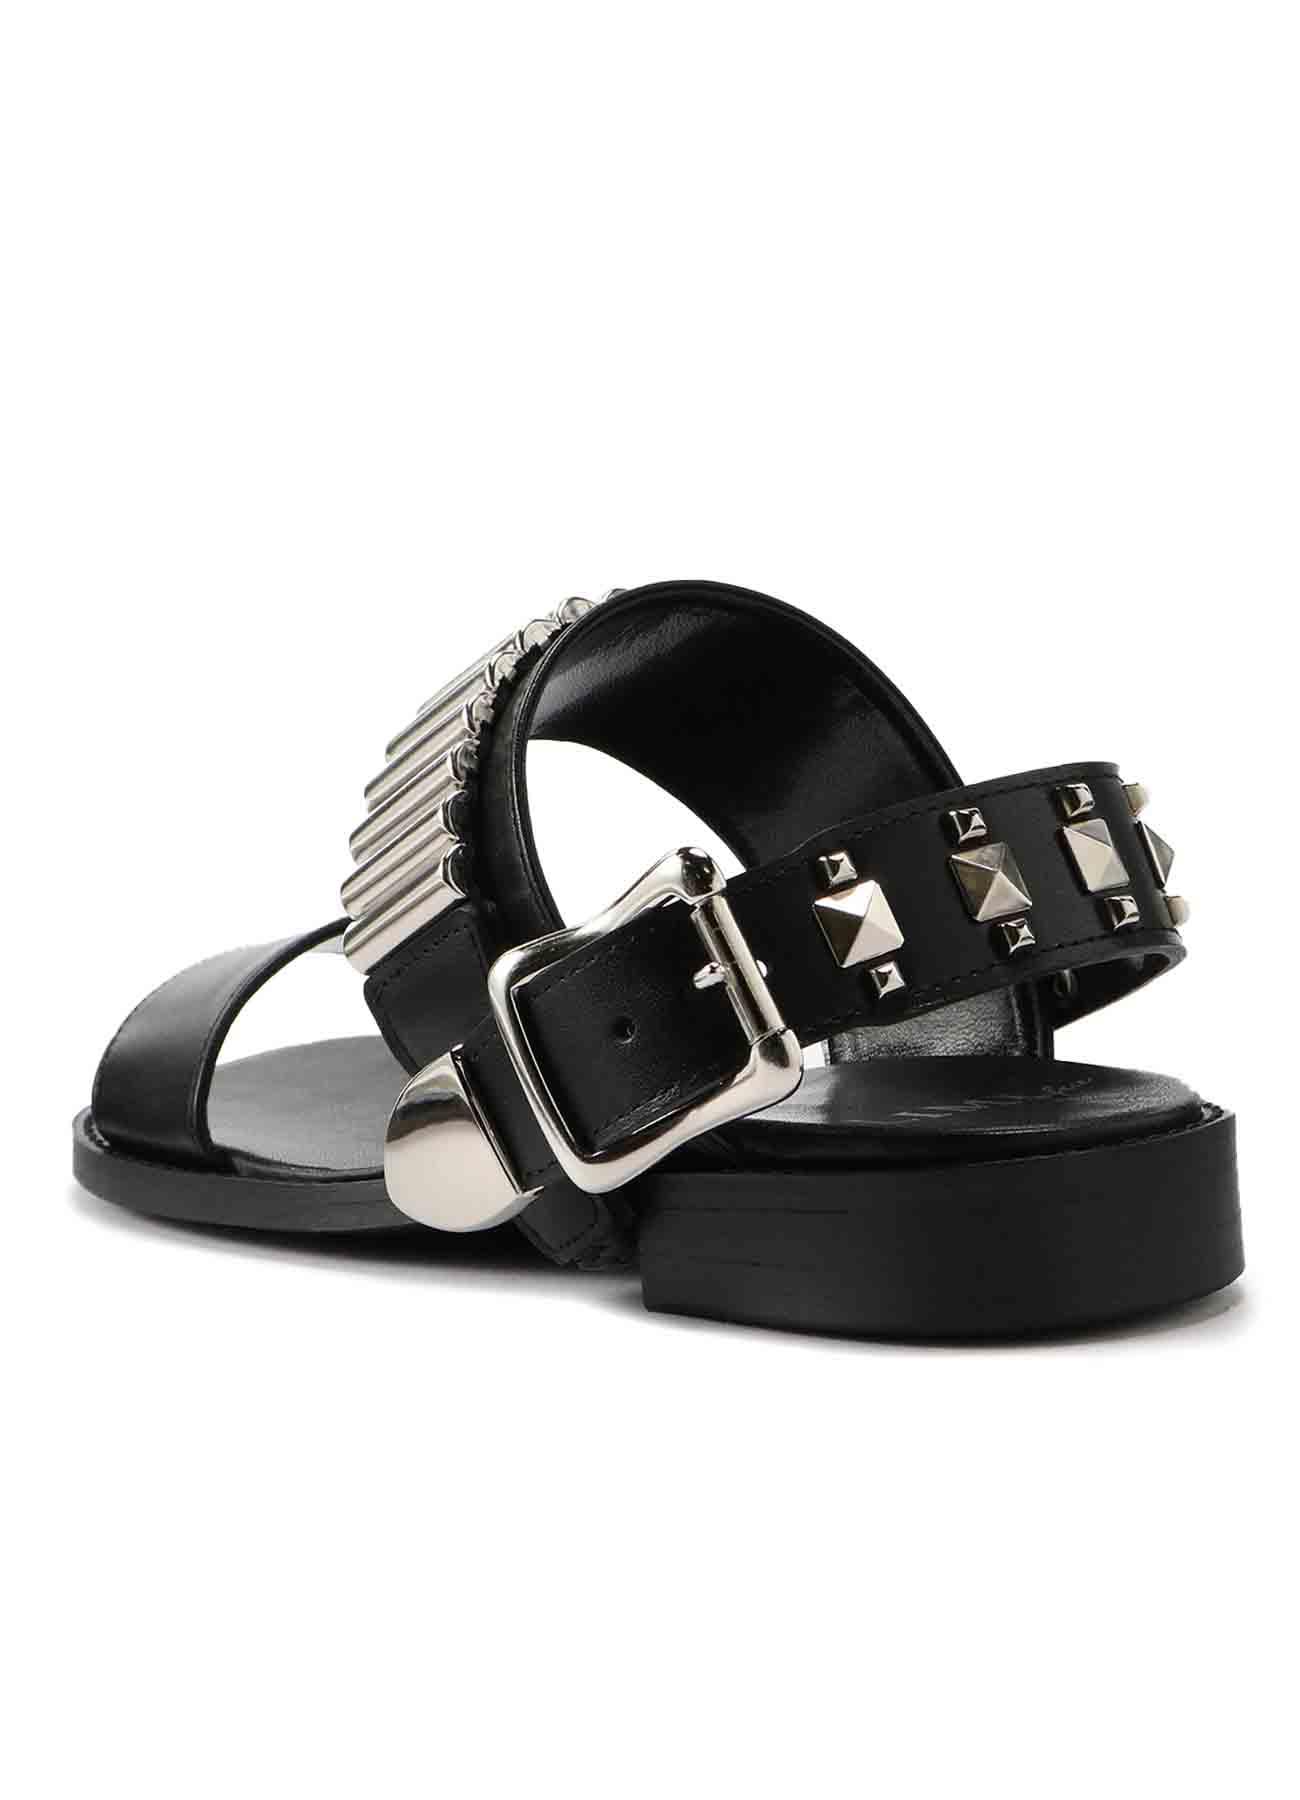 Smooth Leather 2 Way Rivet Sandal